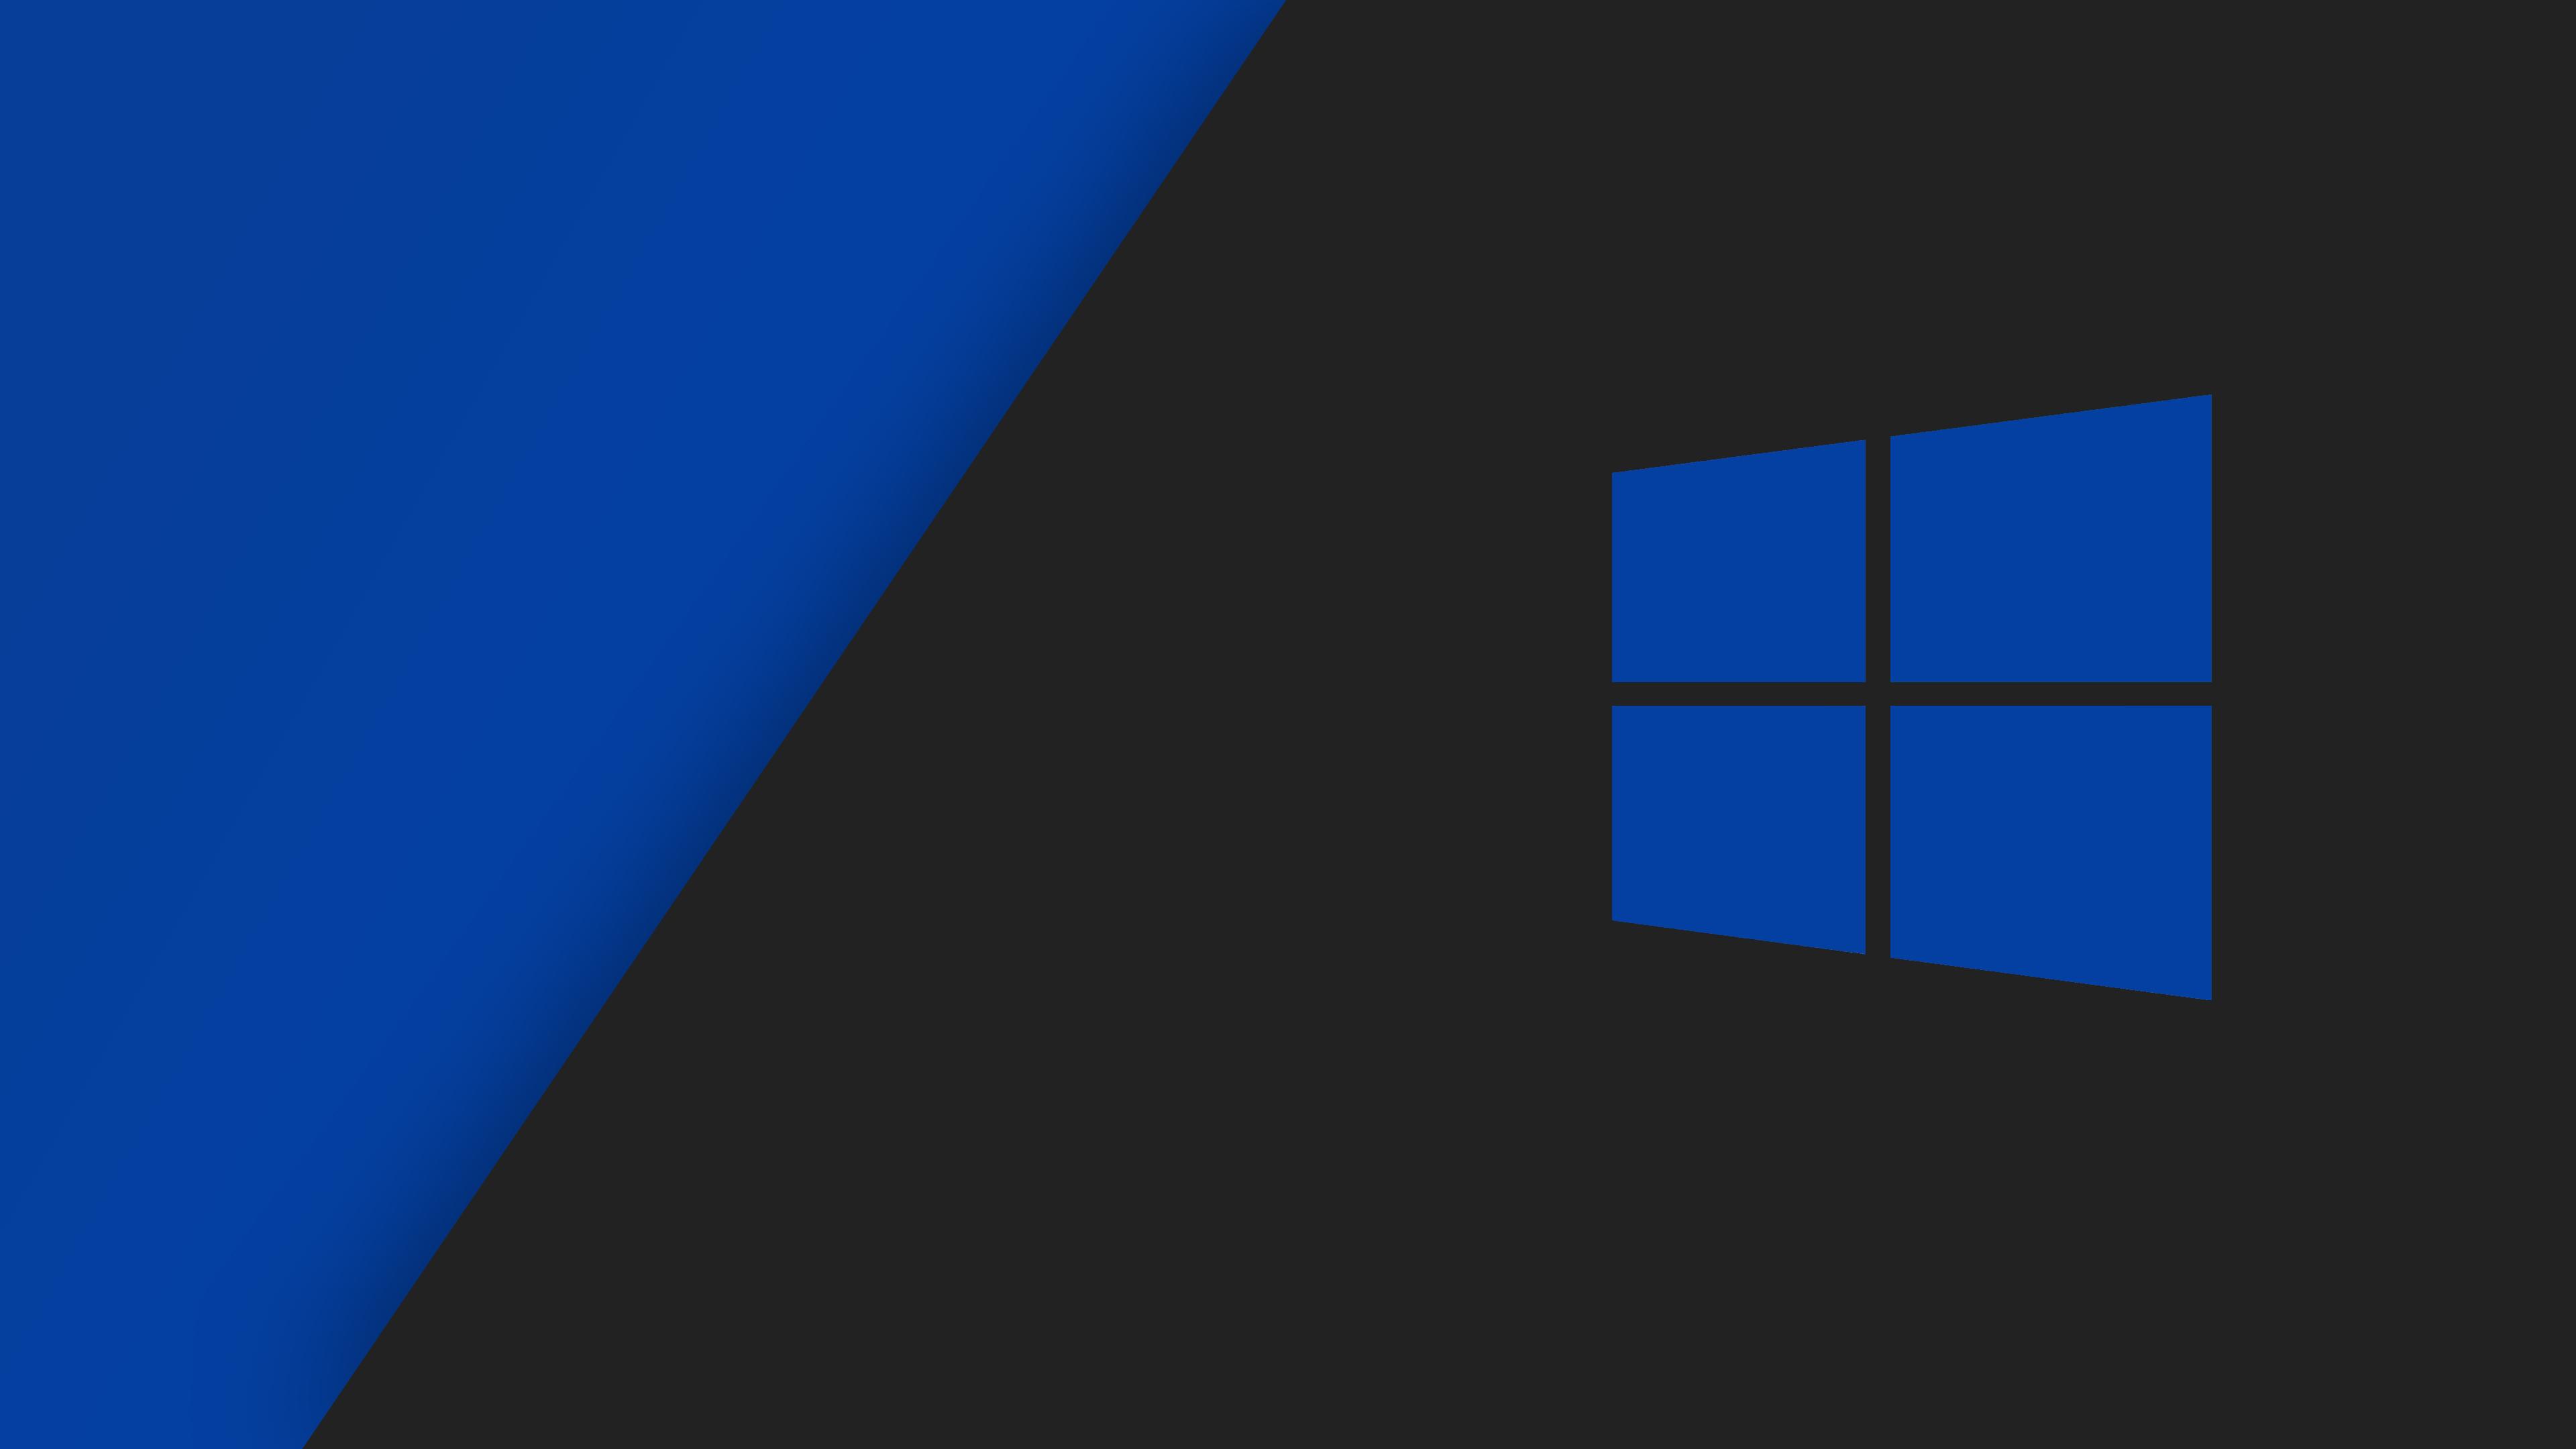 Windows 10 Dark Blue Wallpaper Hd , HD Wallpaper & Backgrounds